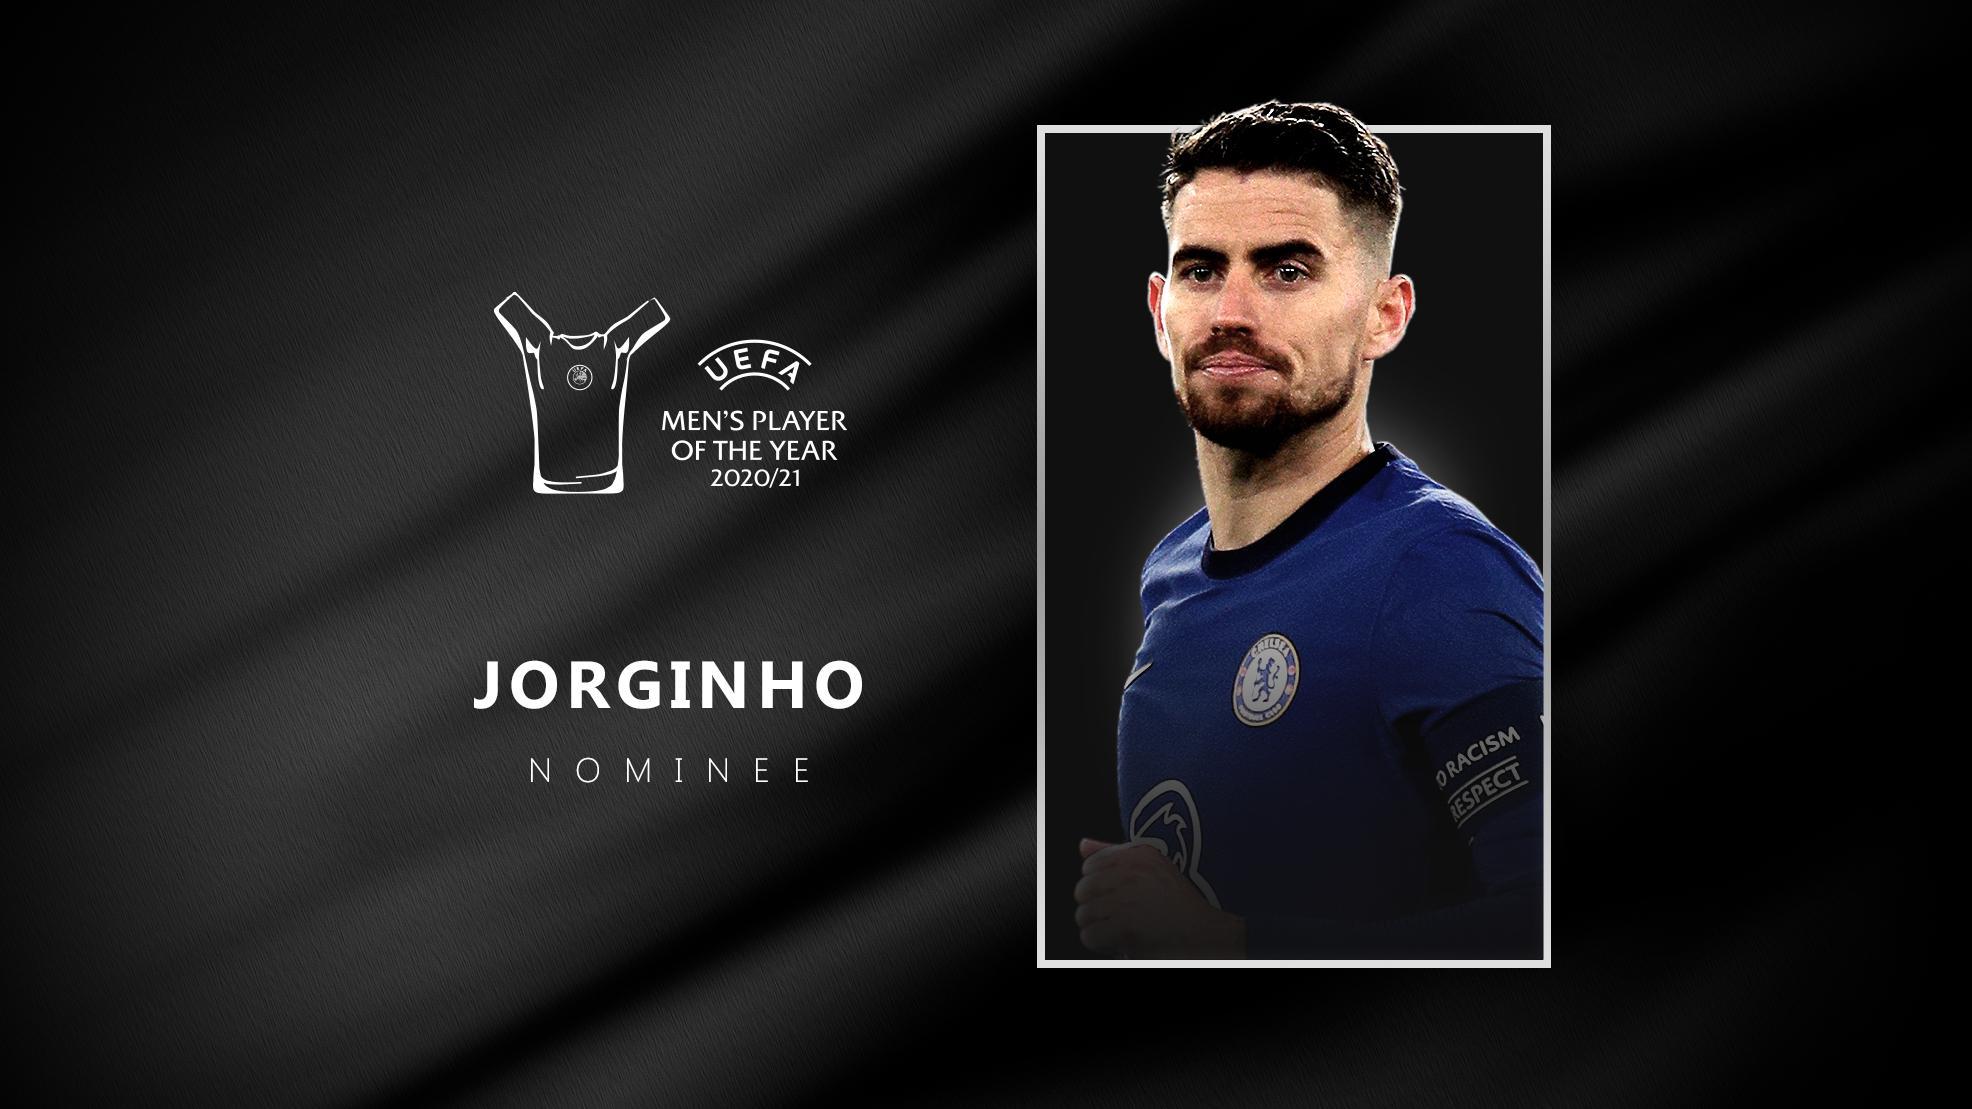 Player of the Year nominee: Jorginho